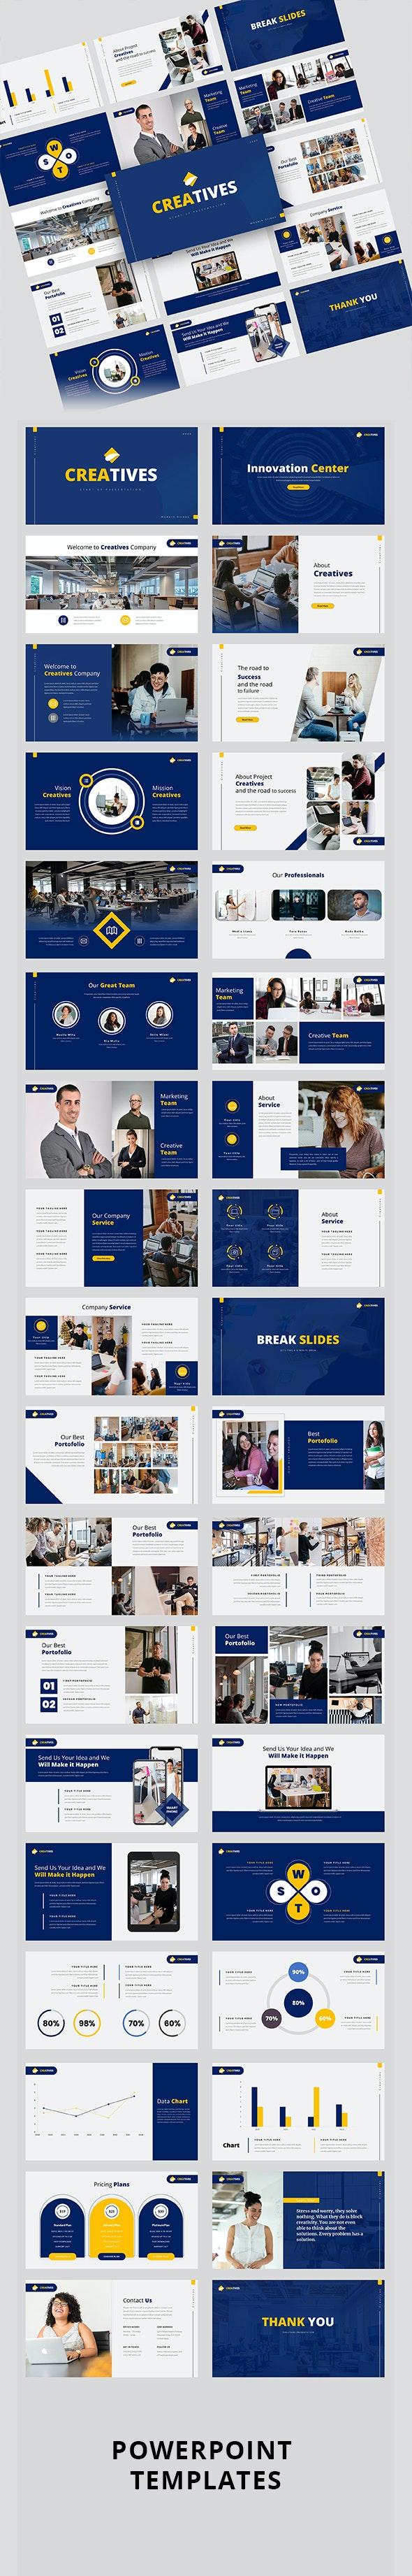 Creatives – Creative Business PowerPoint Template - Creative PowerPoint Templates